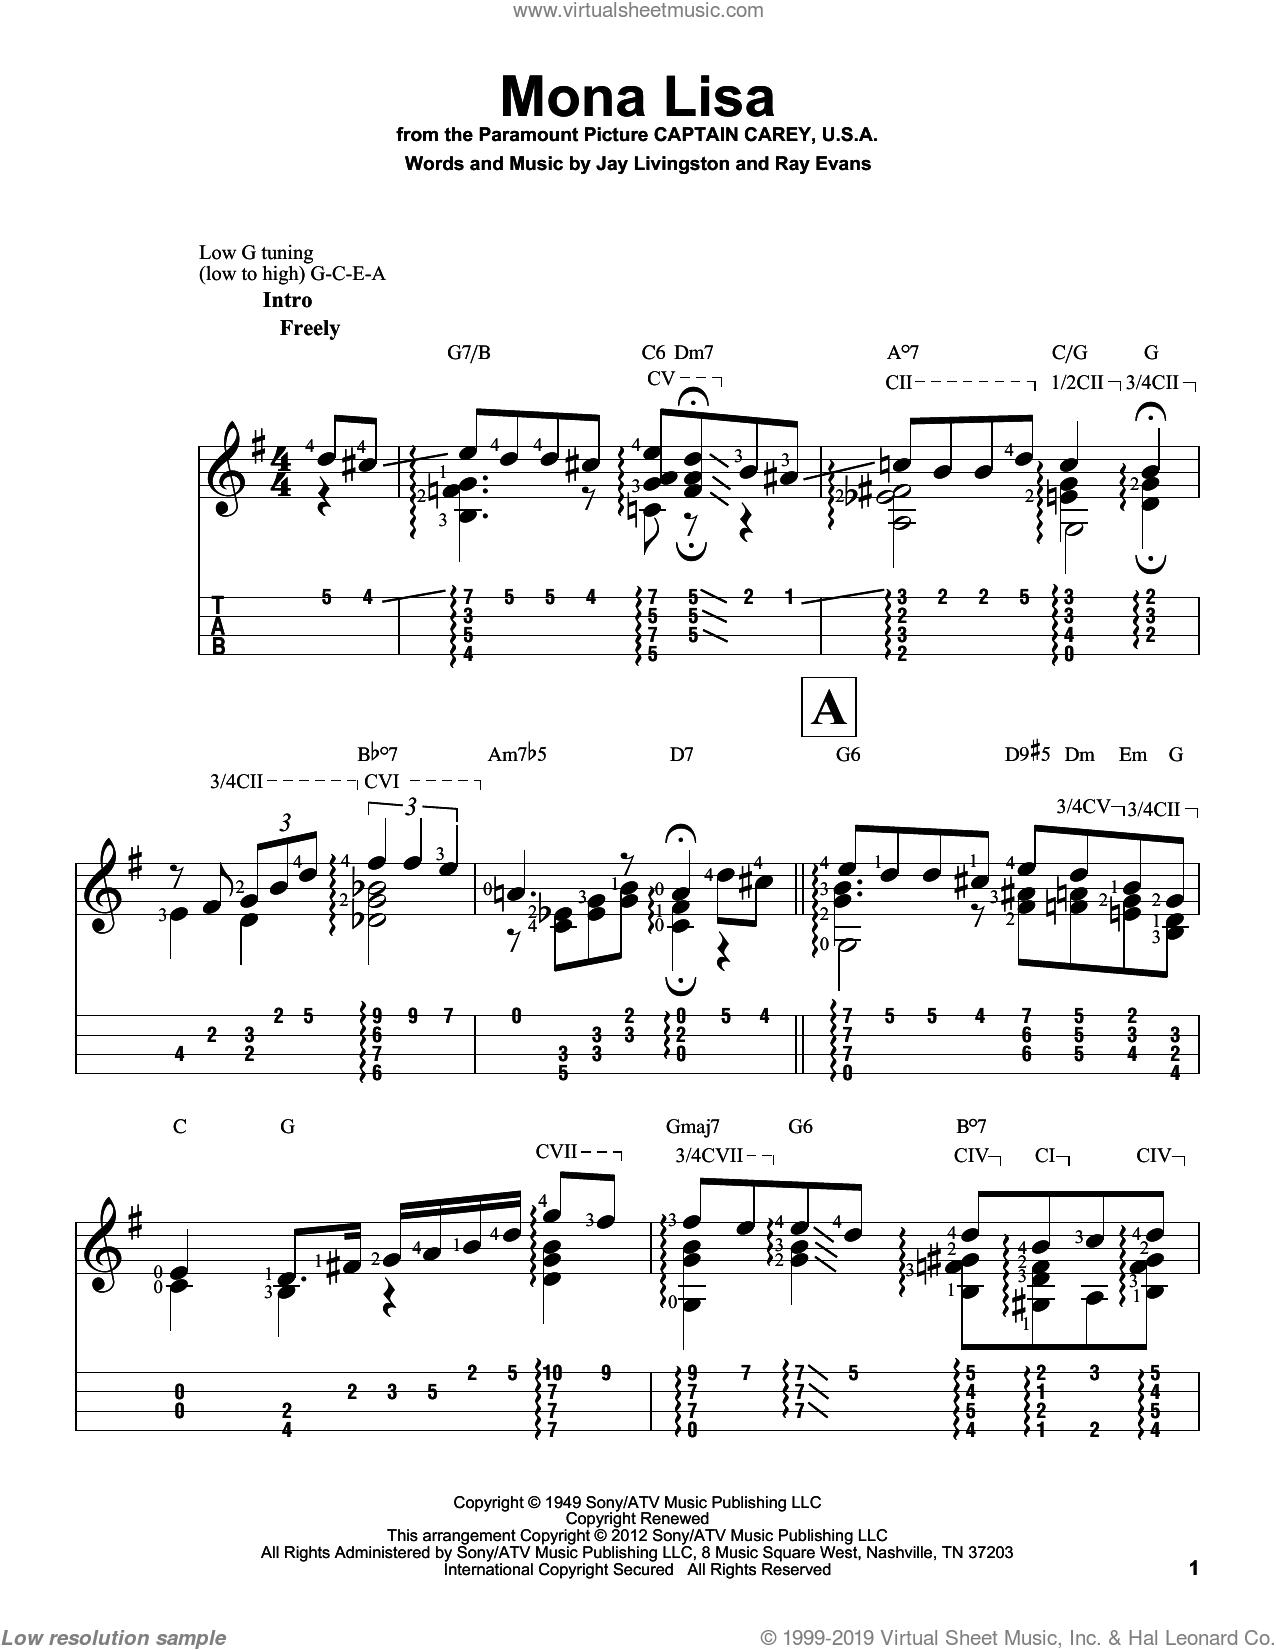 Mona Lisa sheet music for ukulele (easy tablature) (ukulele easy tab) by Nat King Cole, Jay Livingston and Ray Evans, intermediate skill level